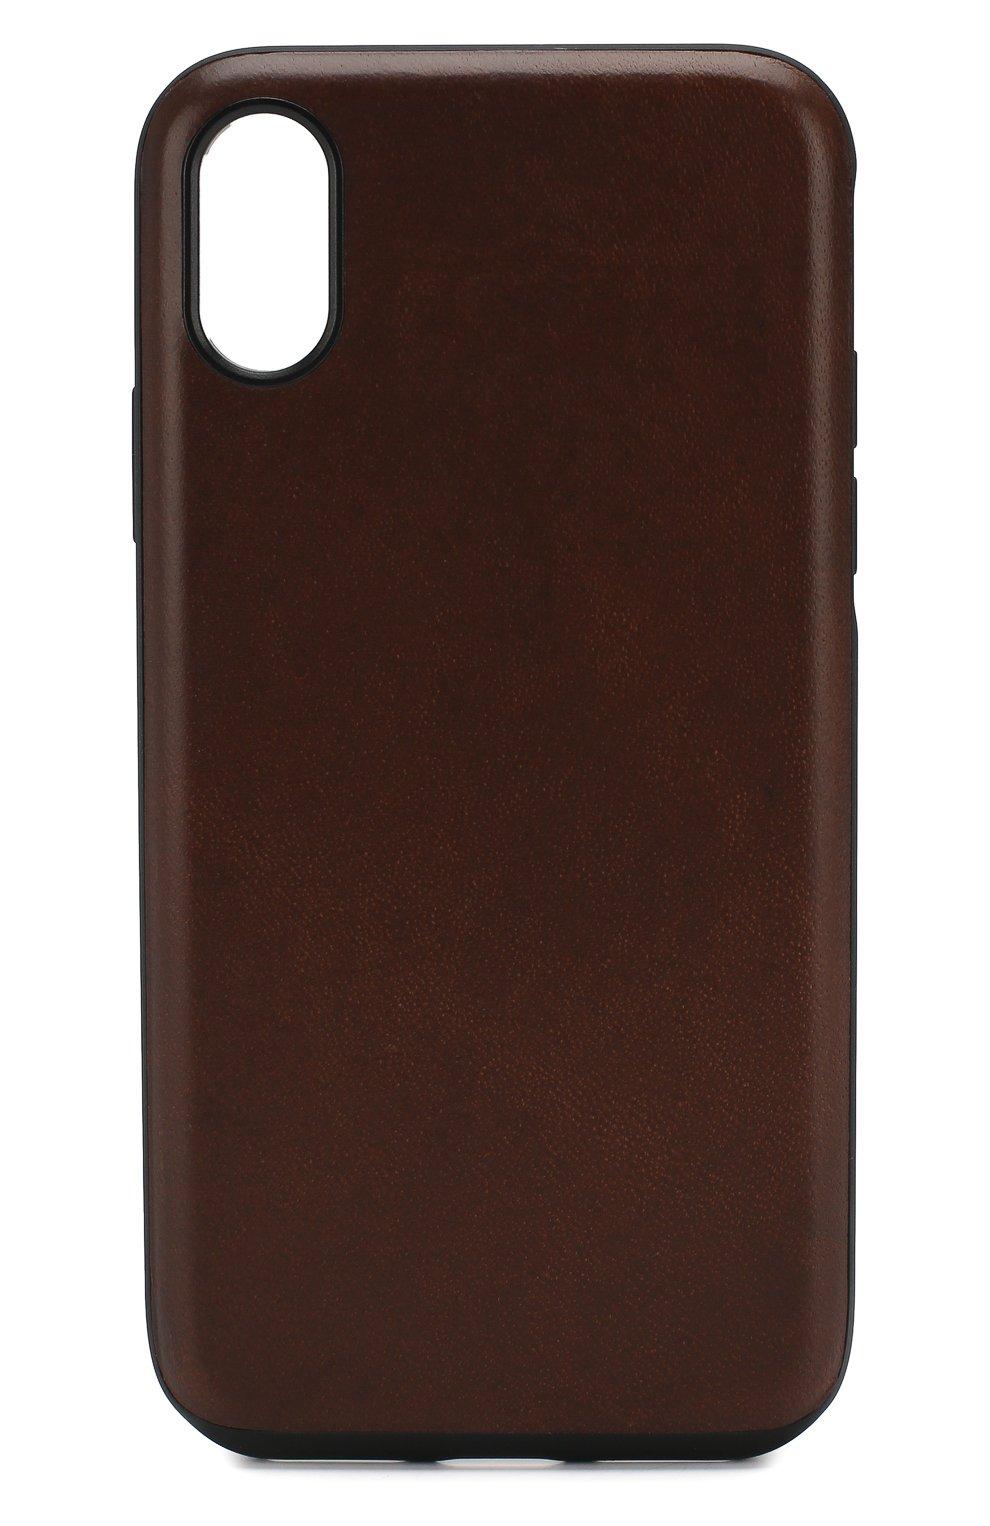 Мужской чехол для iphone x/xs NOMAD коричневого цвета, арт. NM21FR0000 | Фото 1